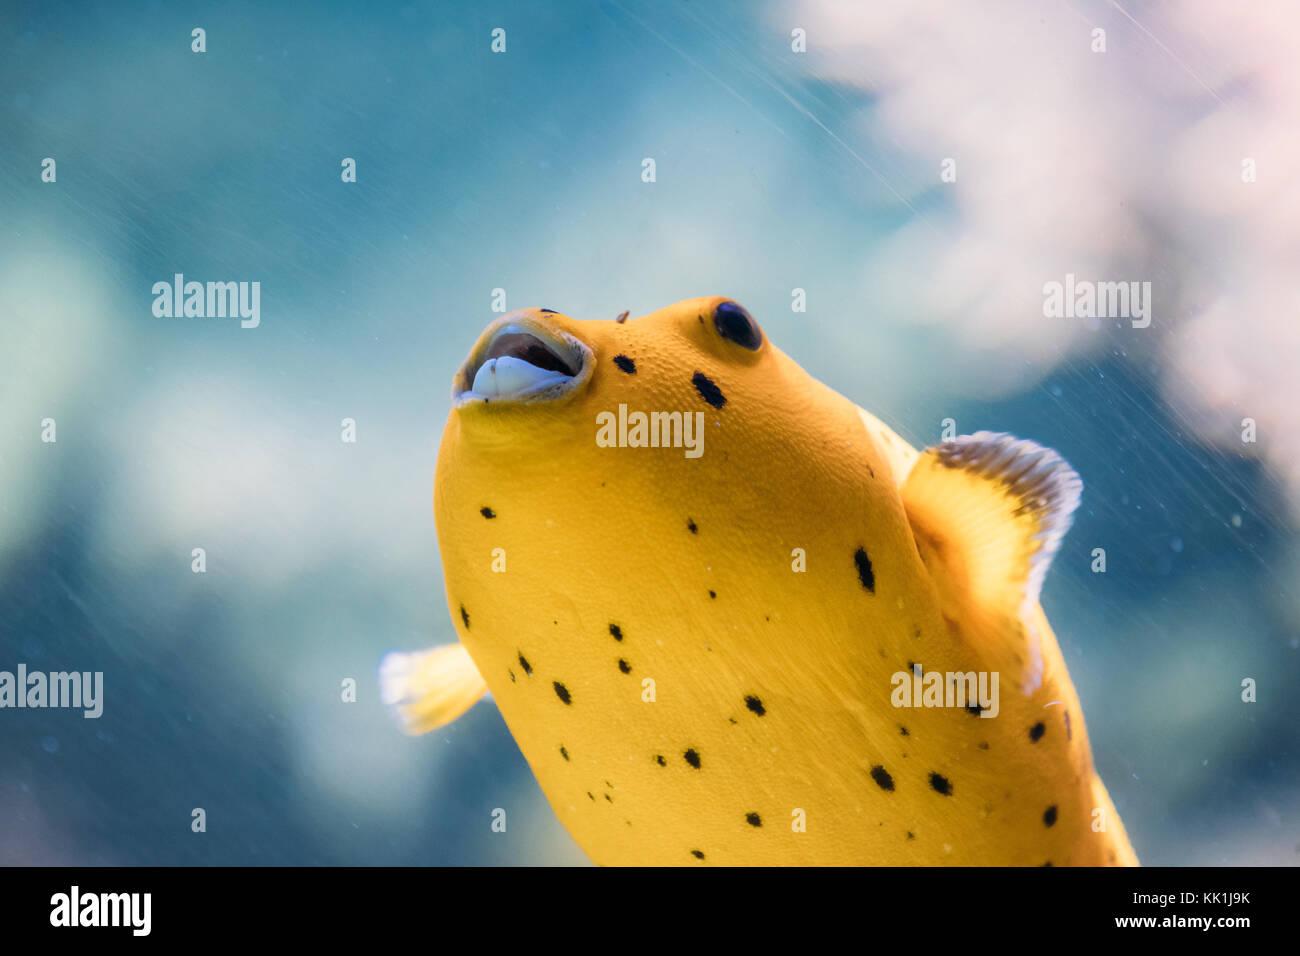 Pufferfish animal stock photos pufferfish animal stock for Water dogs fish